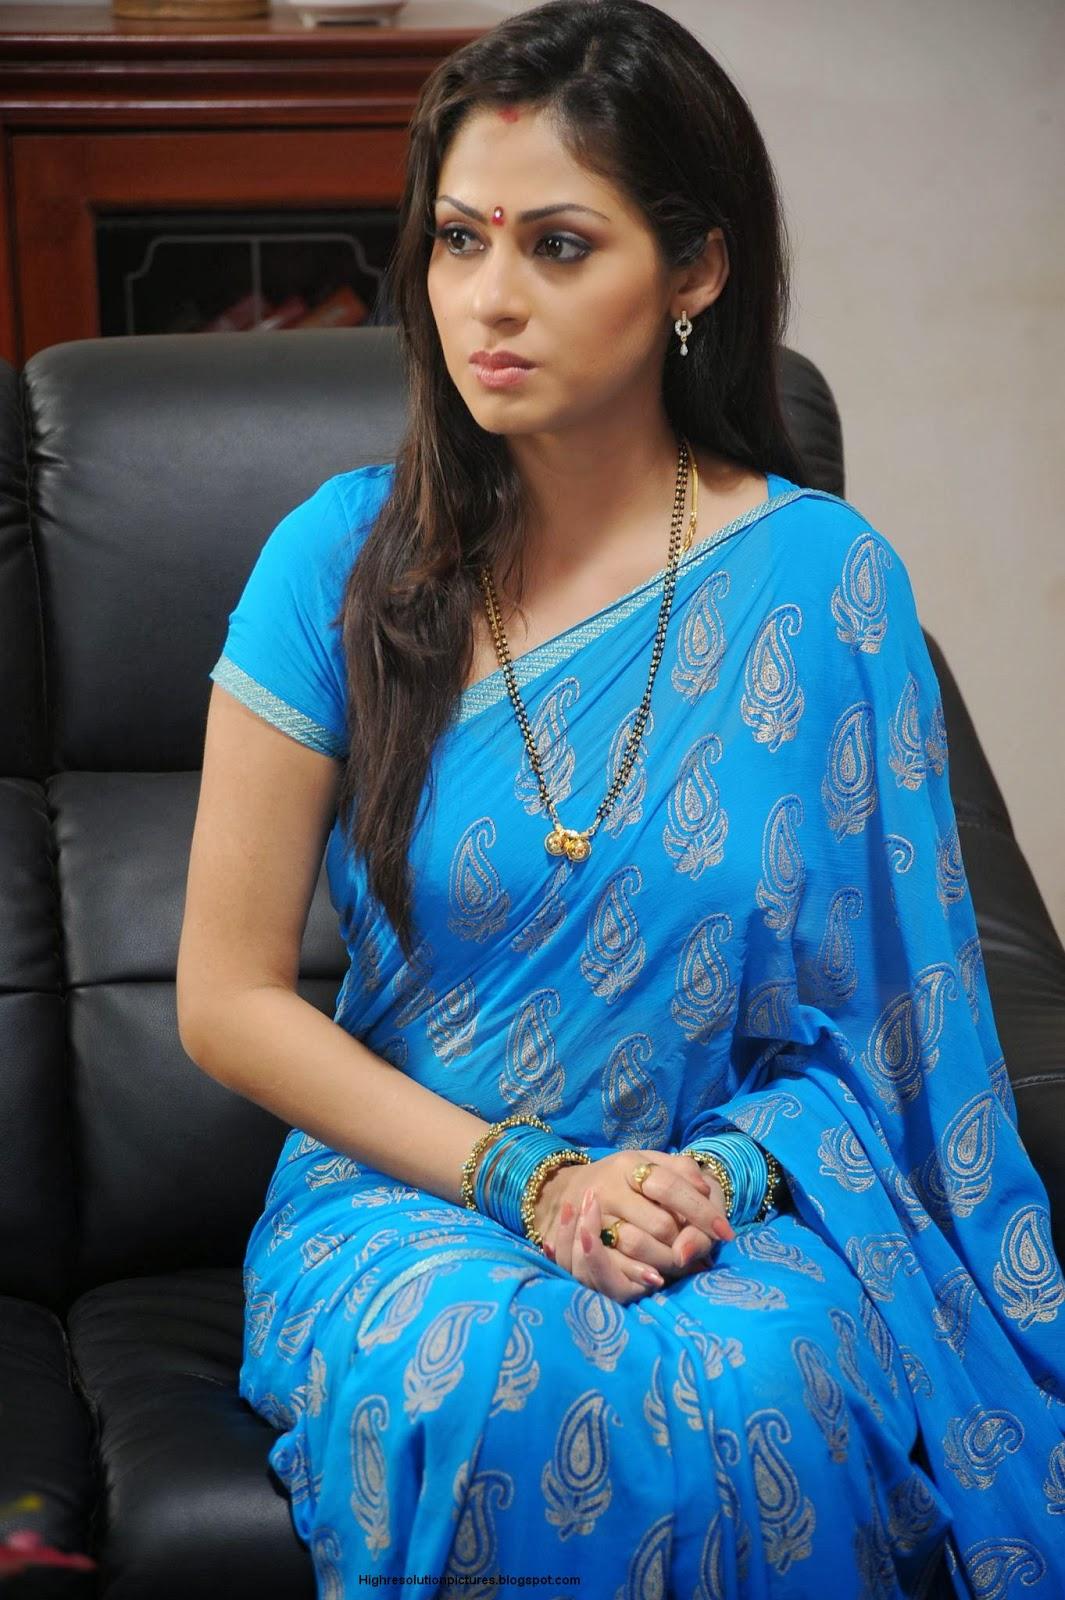 Sadha Saree Stills Hot ~ High Resolution Pictures